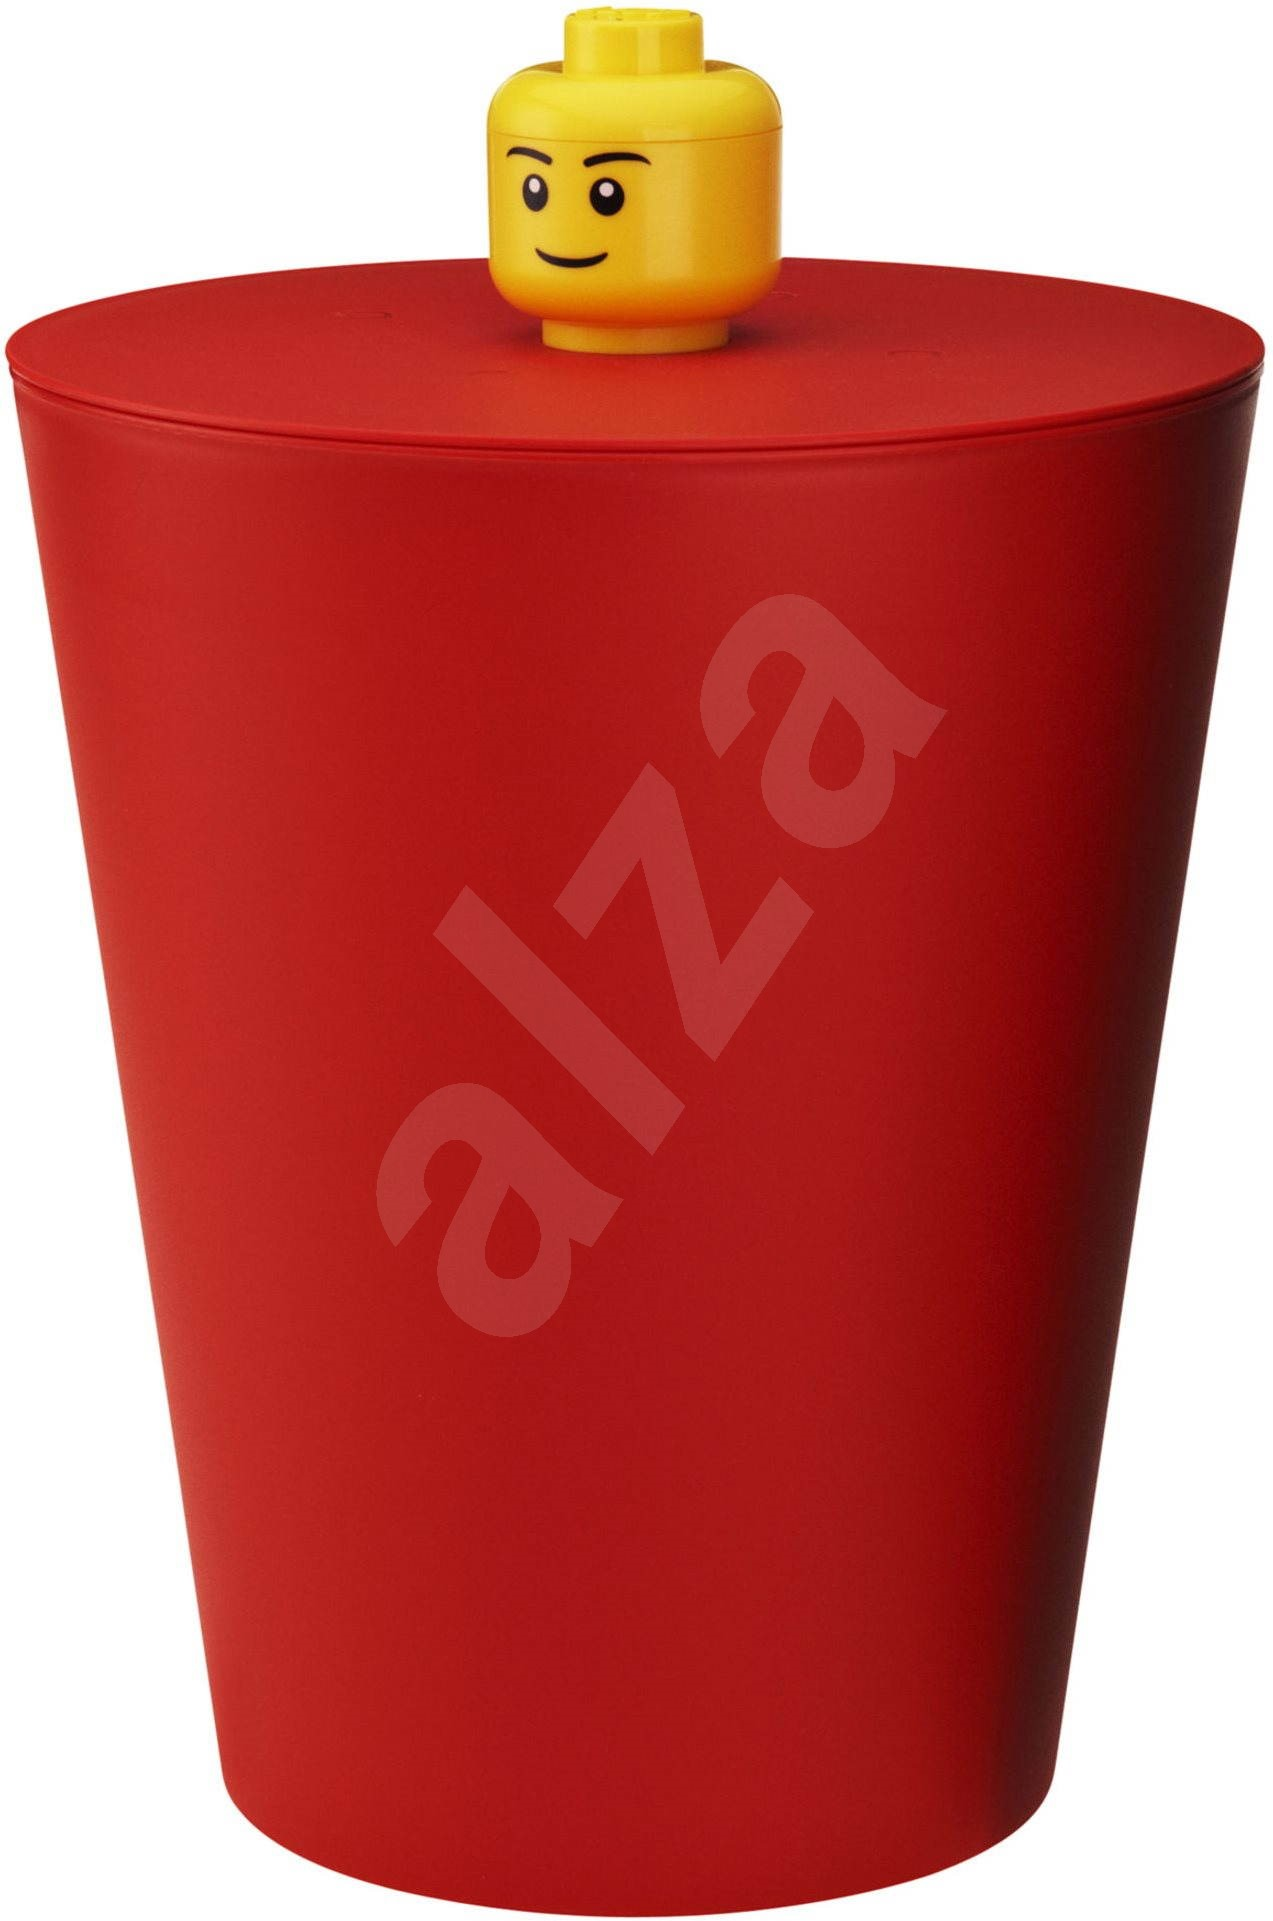 Lego wastebasket red dustbin toys - Rd wastebasket ...